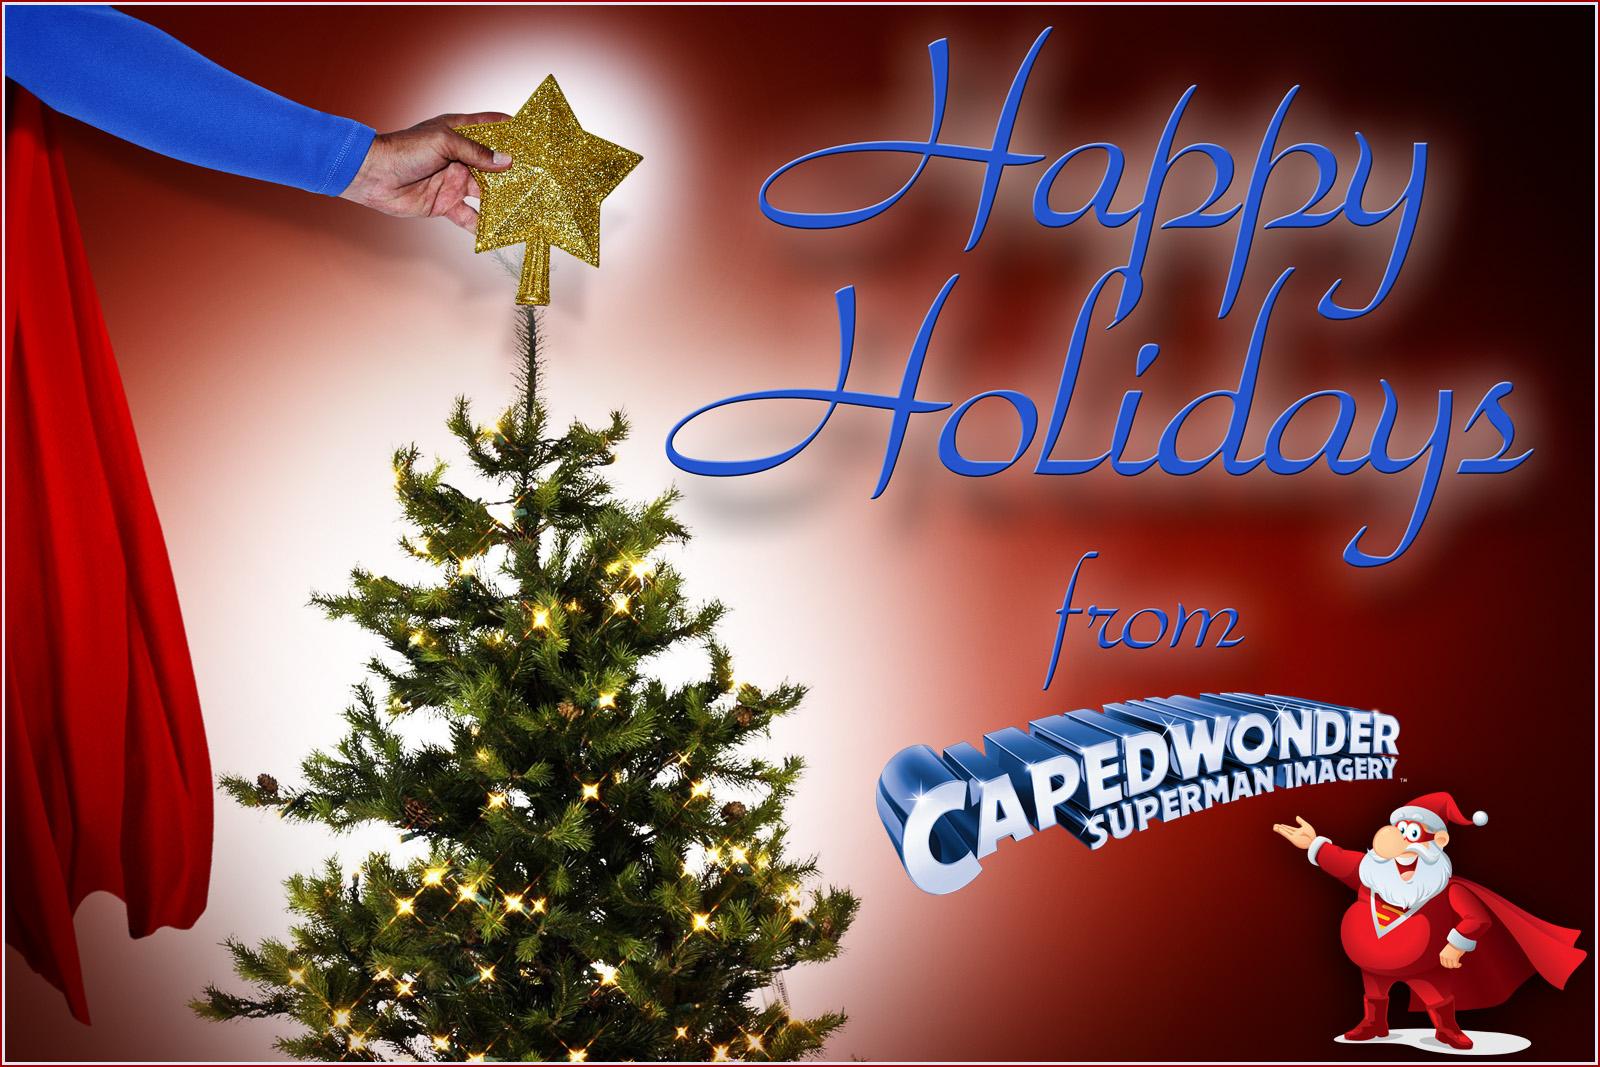 Happy Holidays from CapedWonder.com!